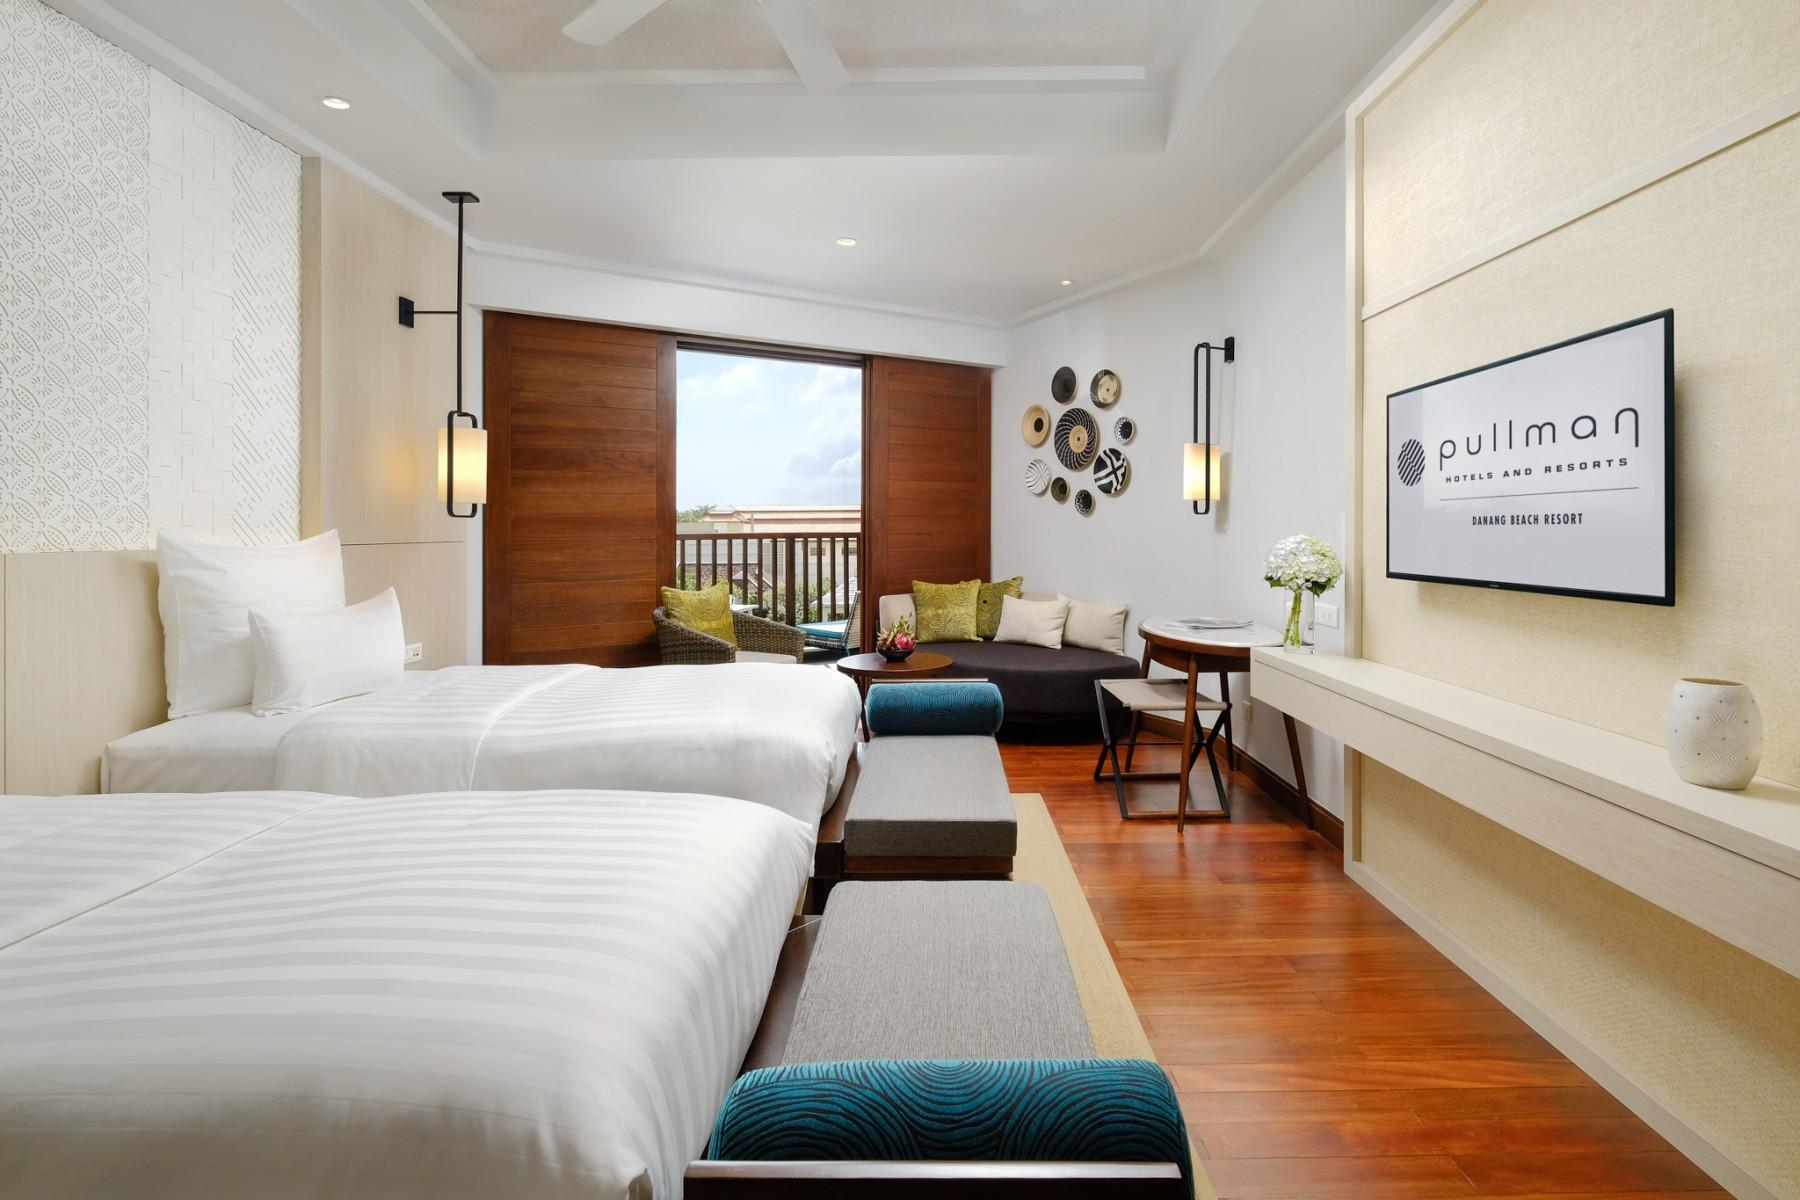 deluxe-king-bed-room-cottage-at-pullman-danang-beach-resort-vietnam-5-star-hotel